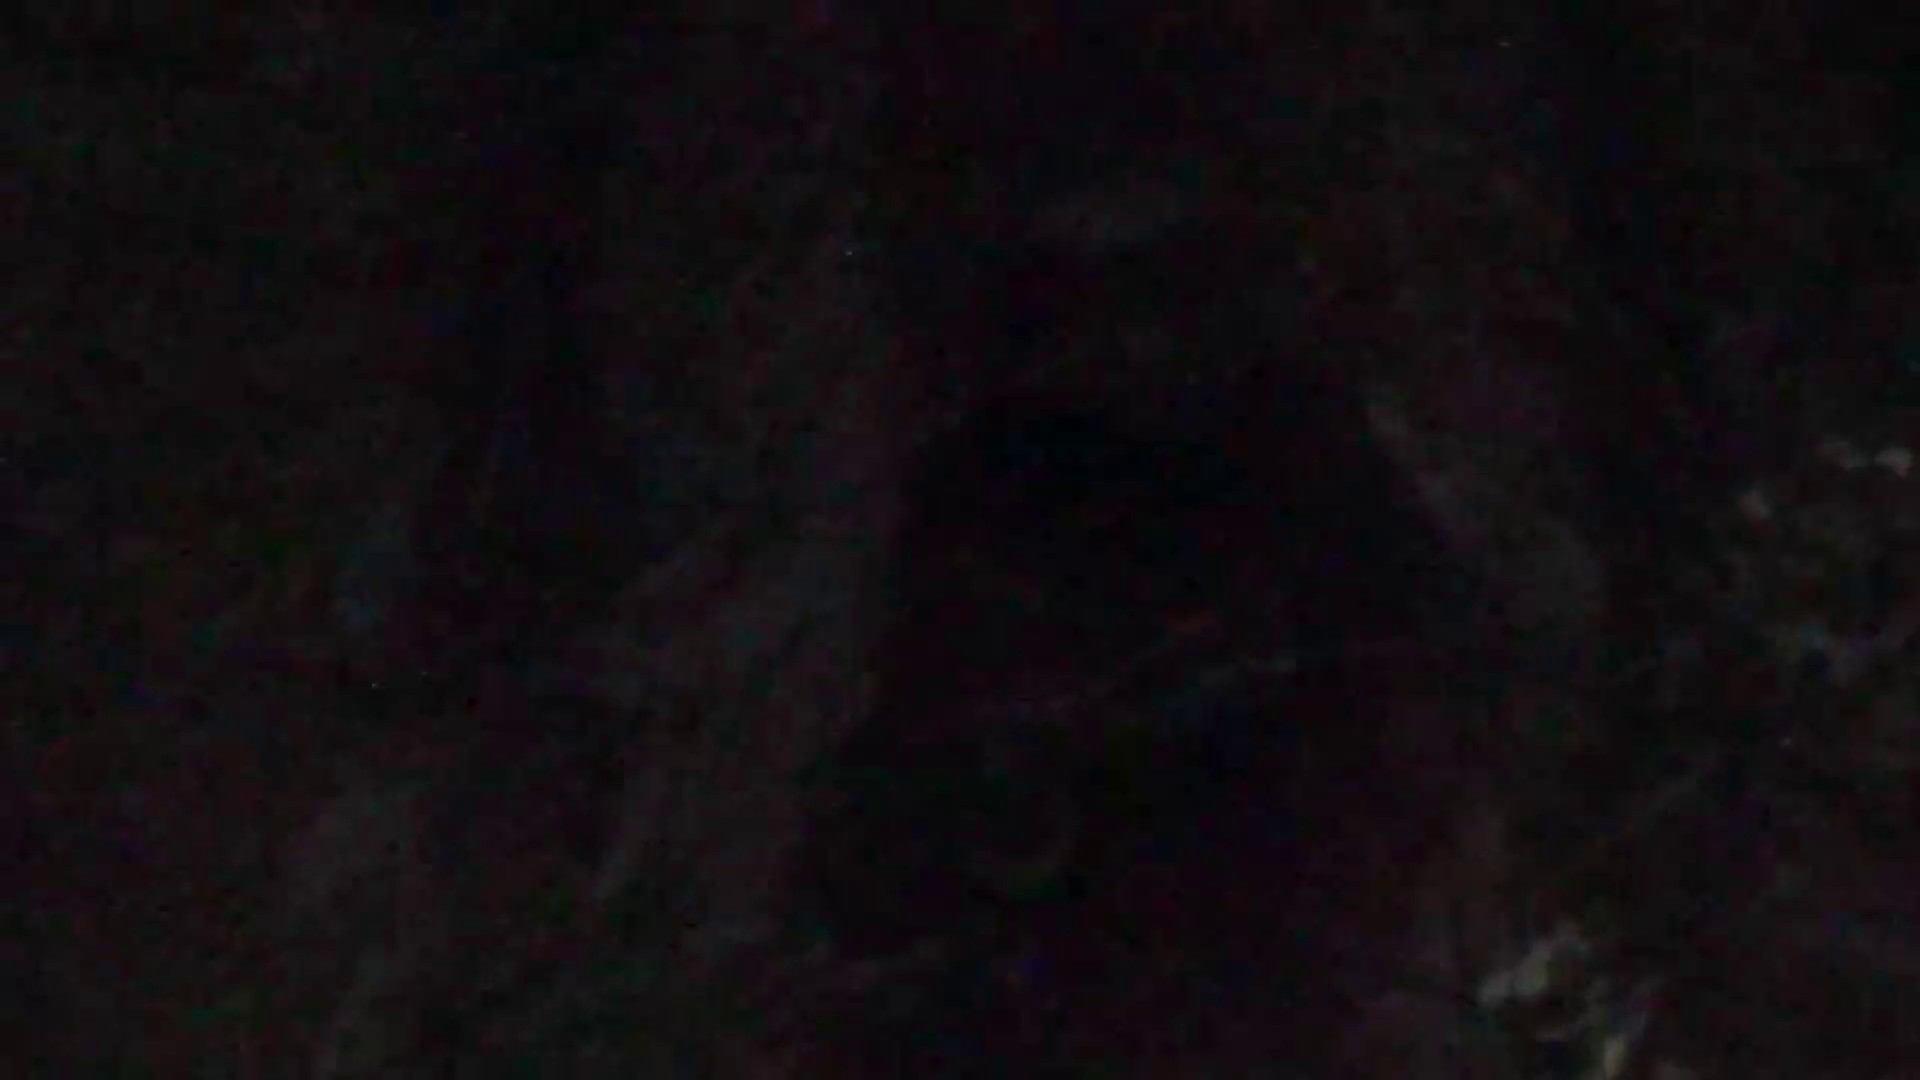 JD盗撮 美女の洗面所の秘密 Vol.28 OLのボディ | 美女のボディ  55PIX 51